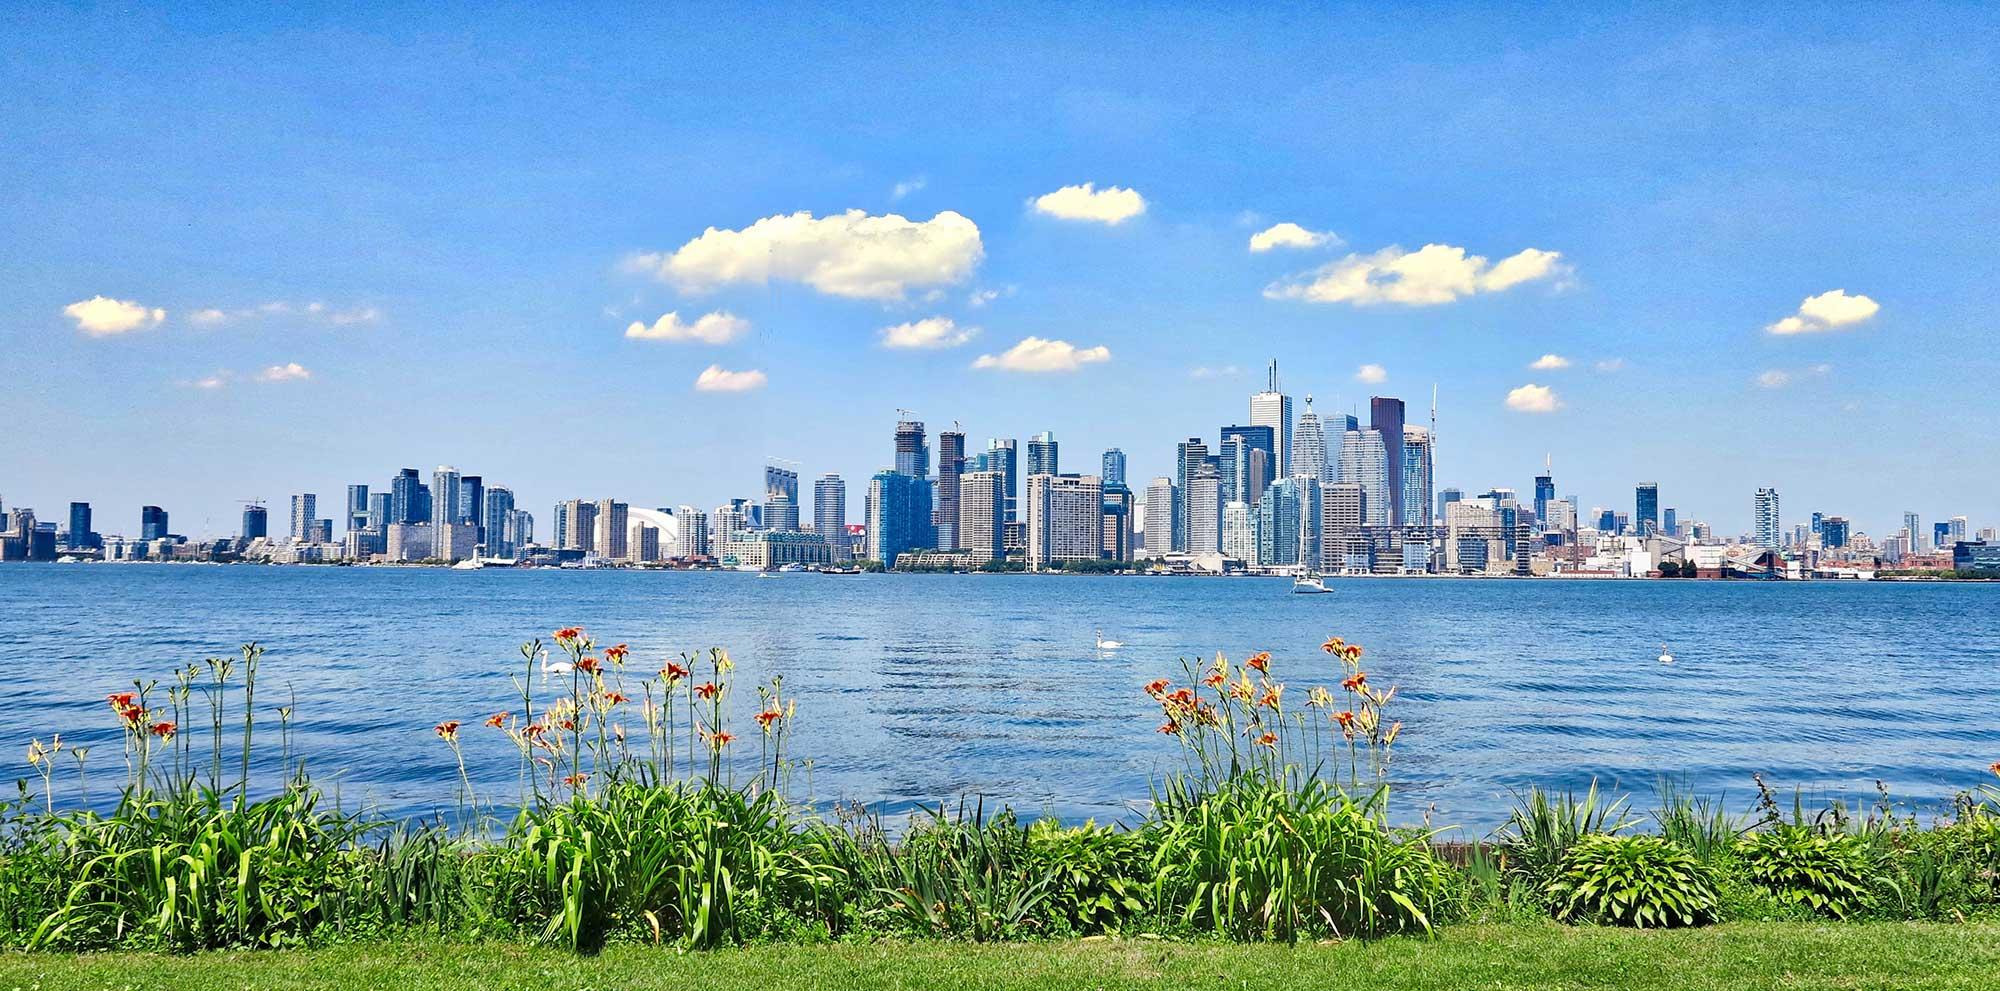 investissement immobilier montreal quebec canada